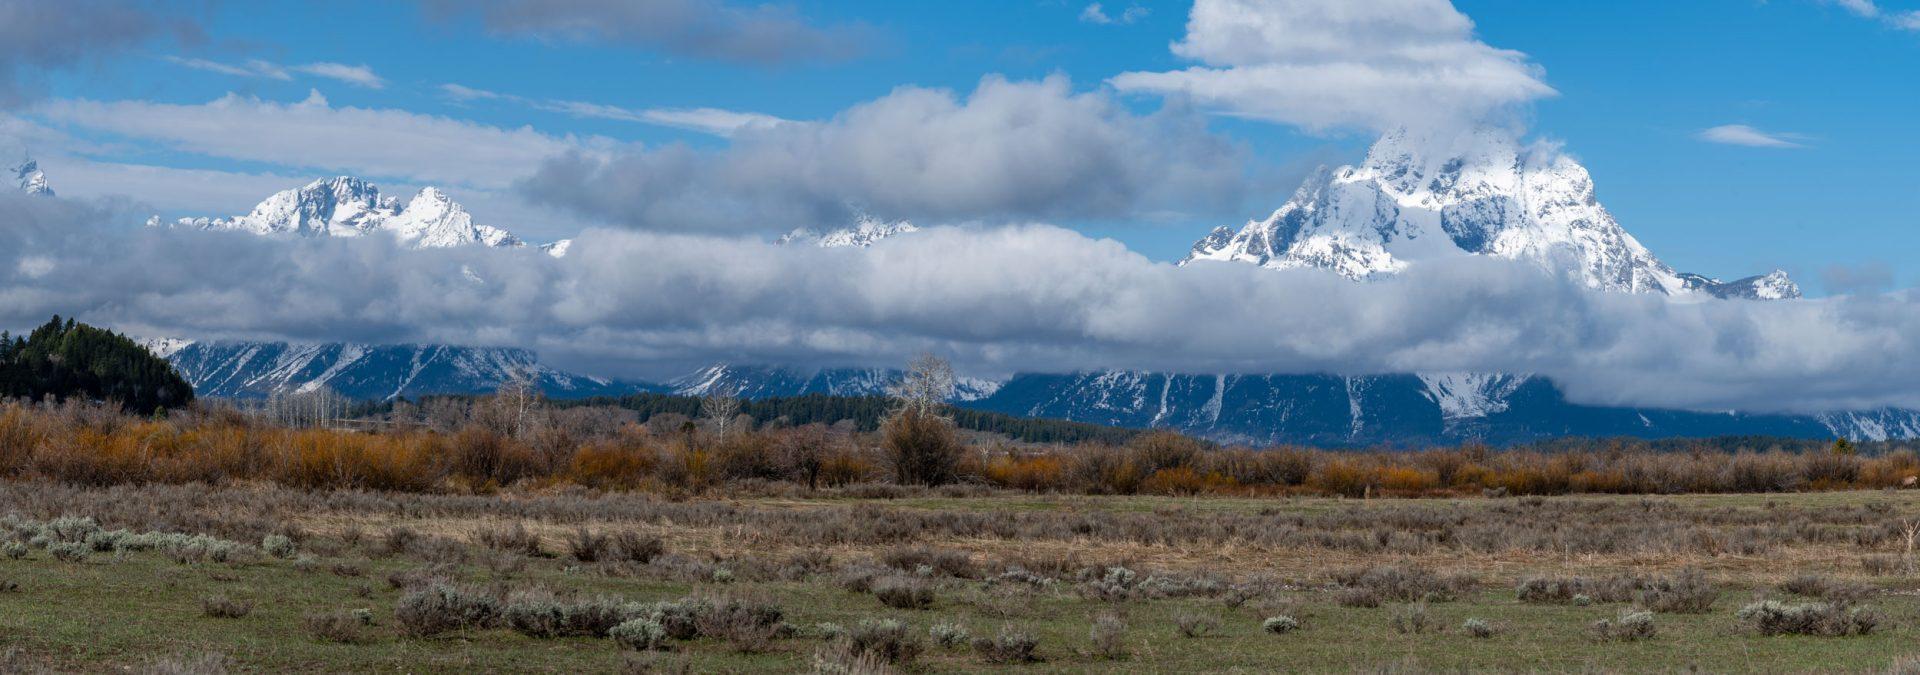 Panoramic view of Grand Teton National Park